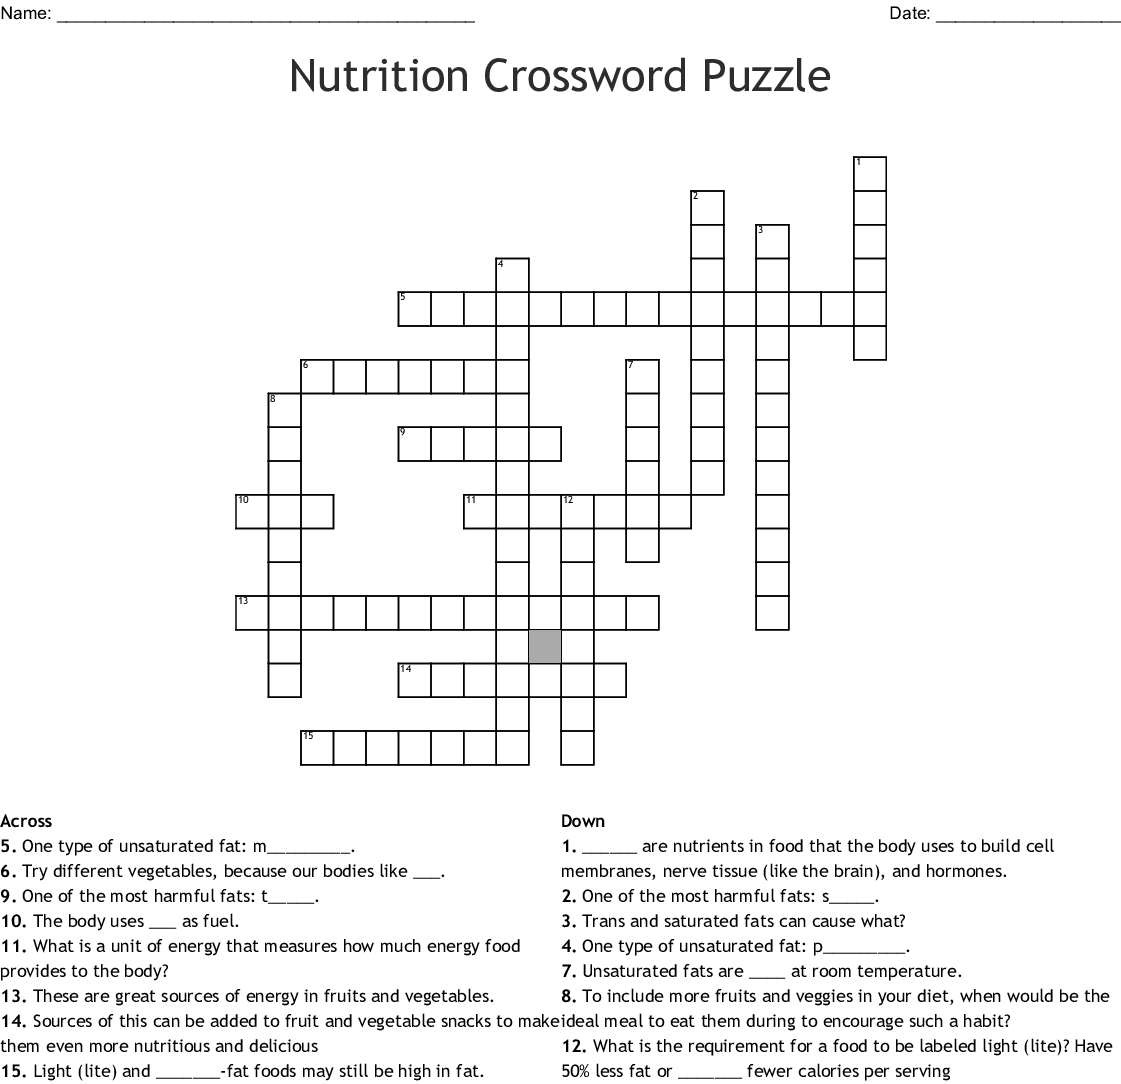 Nutrition Crossword Puzzle